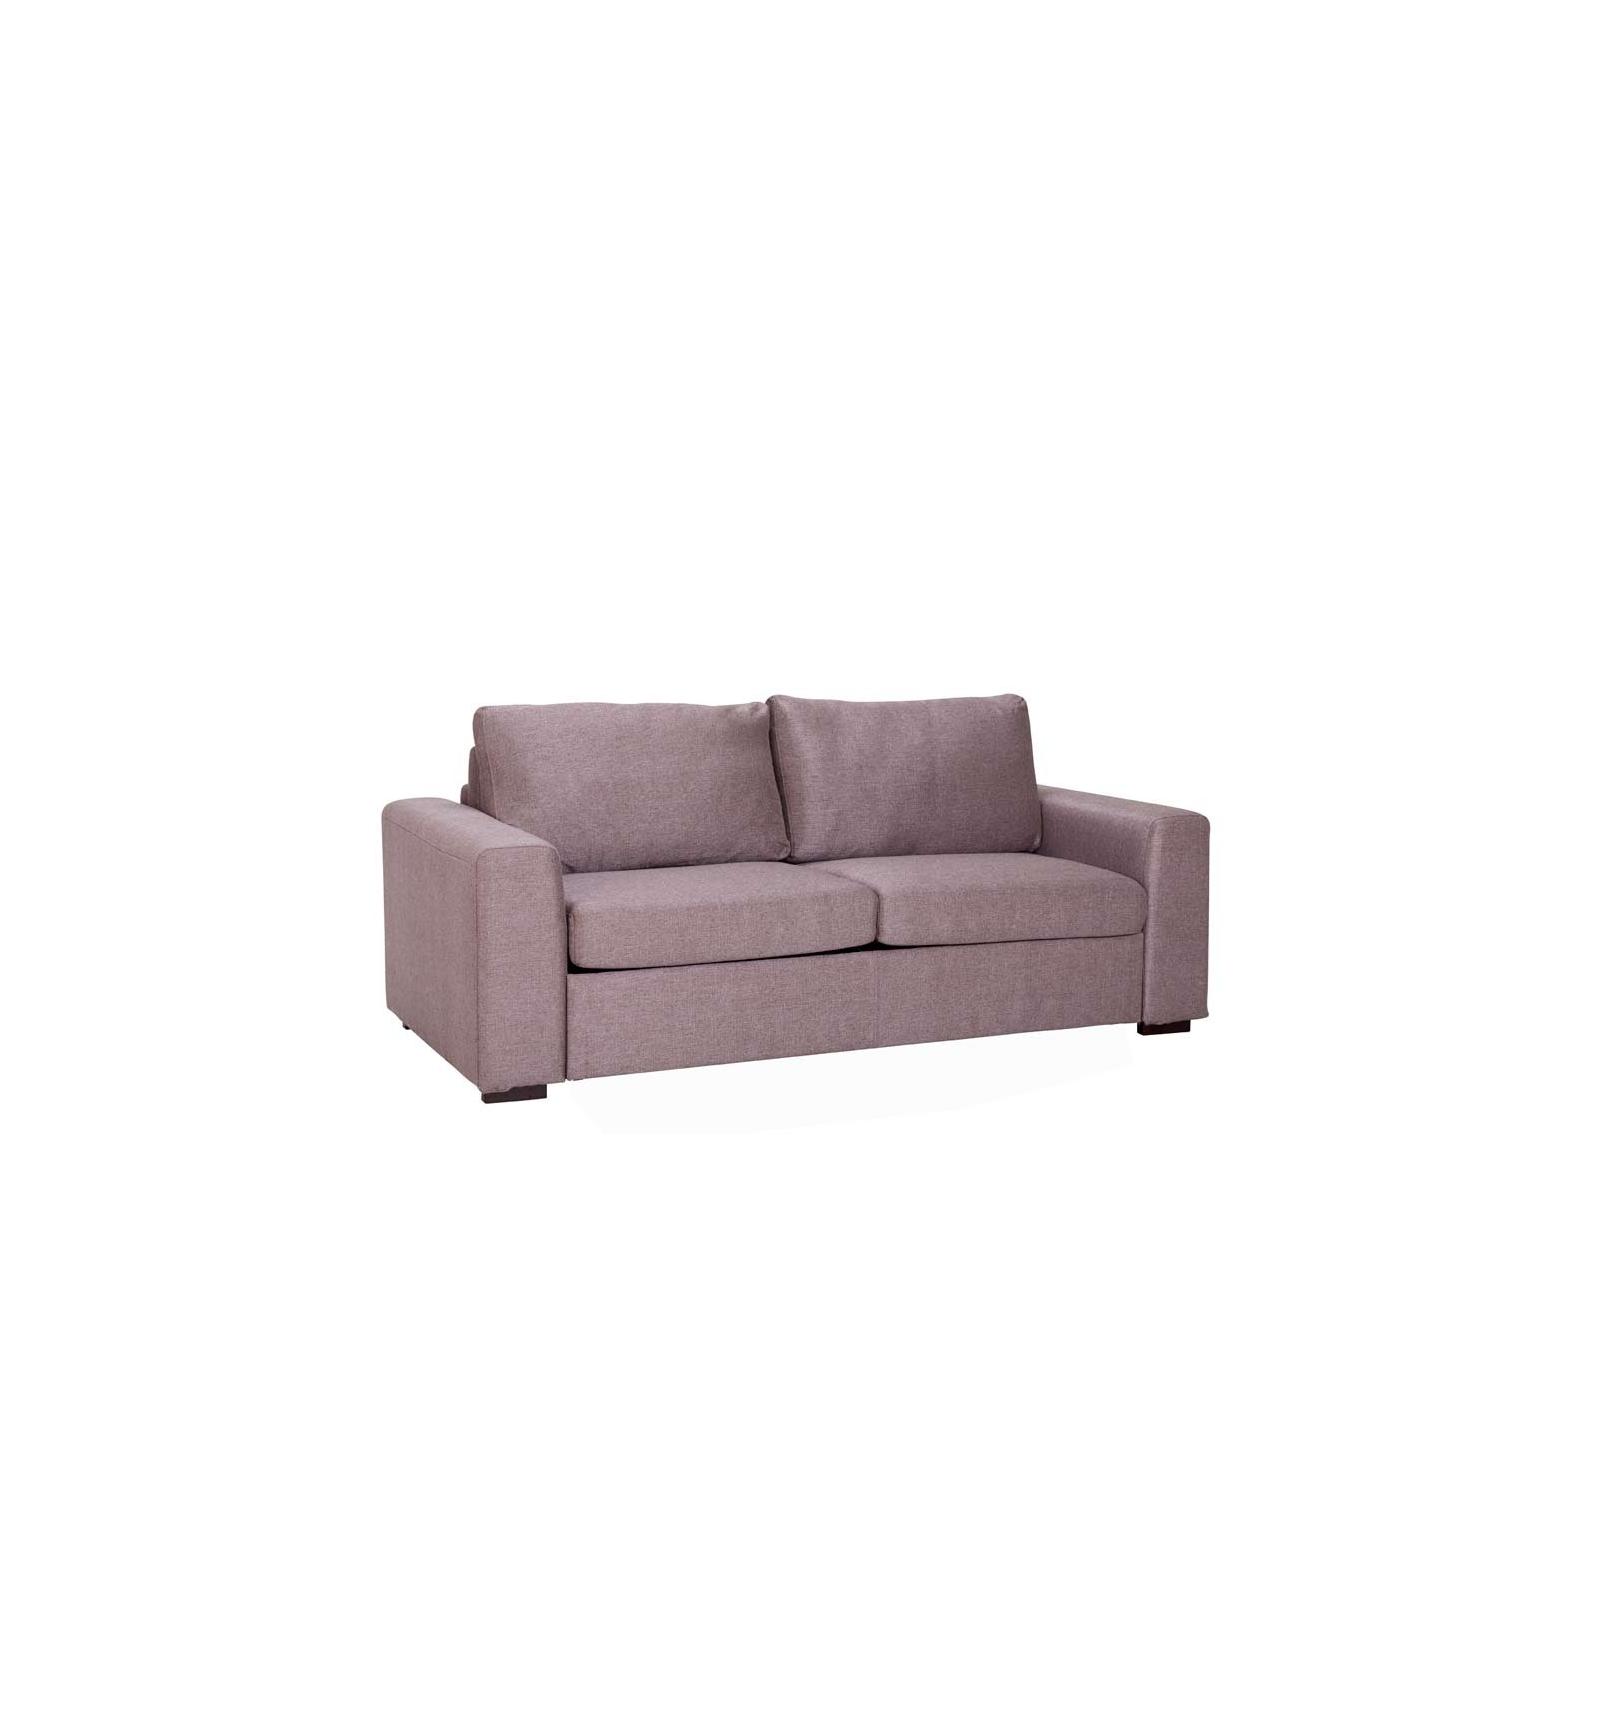 schlafcouch ausklappbar trendy schlafsofa ausklappbar schlafsofa espo ausklappbar grauuwei. Black Bedroom Furniture Sets. Home Design Ideas